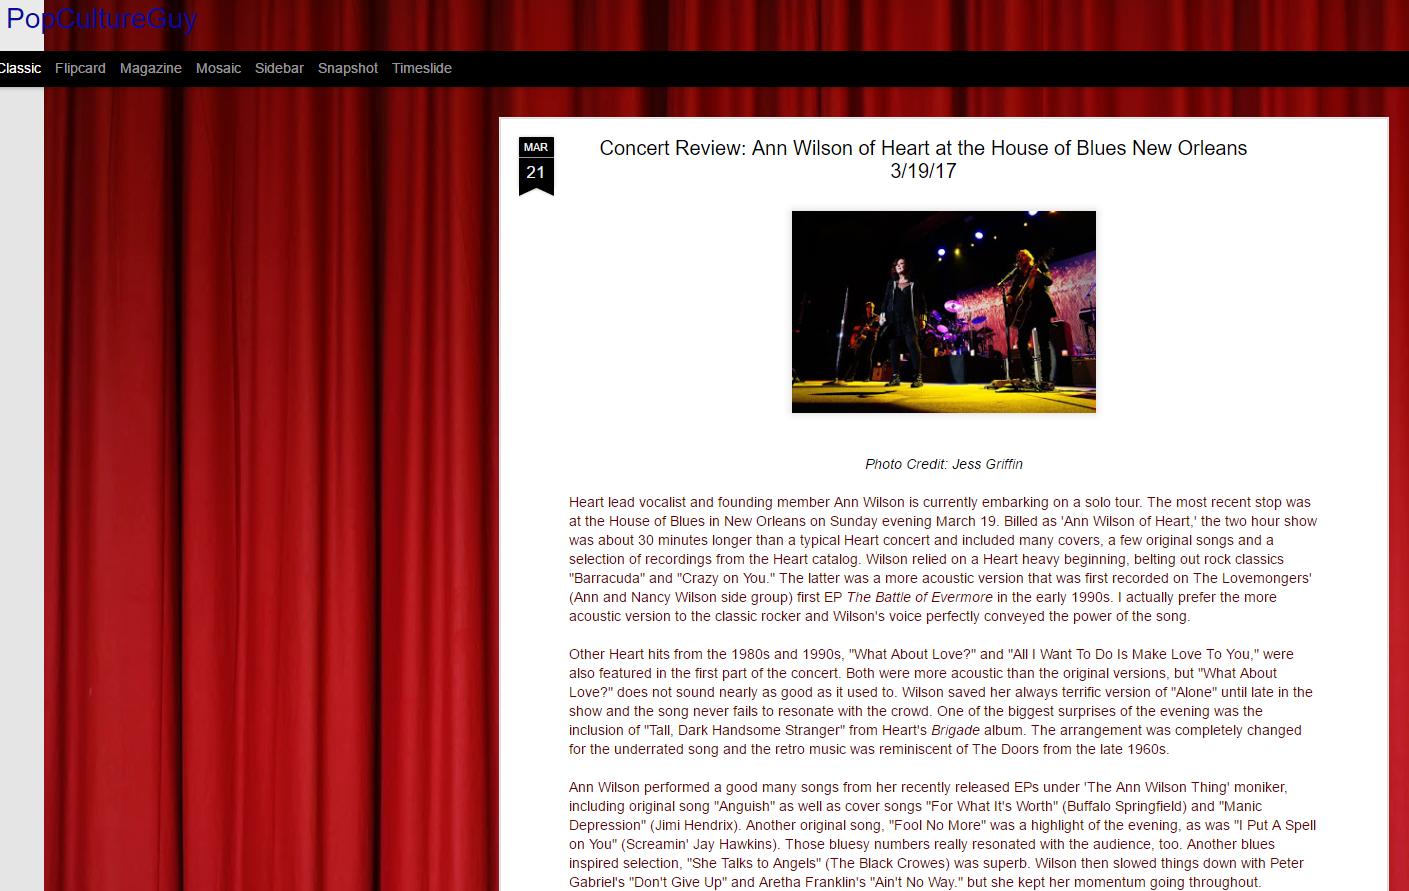 concert review format